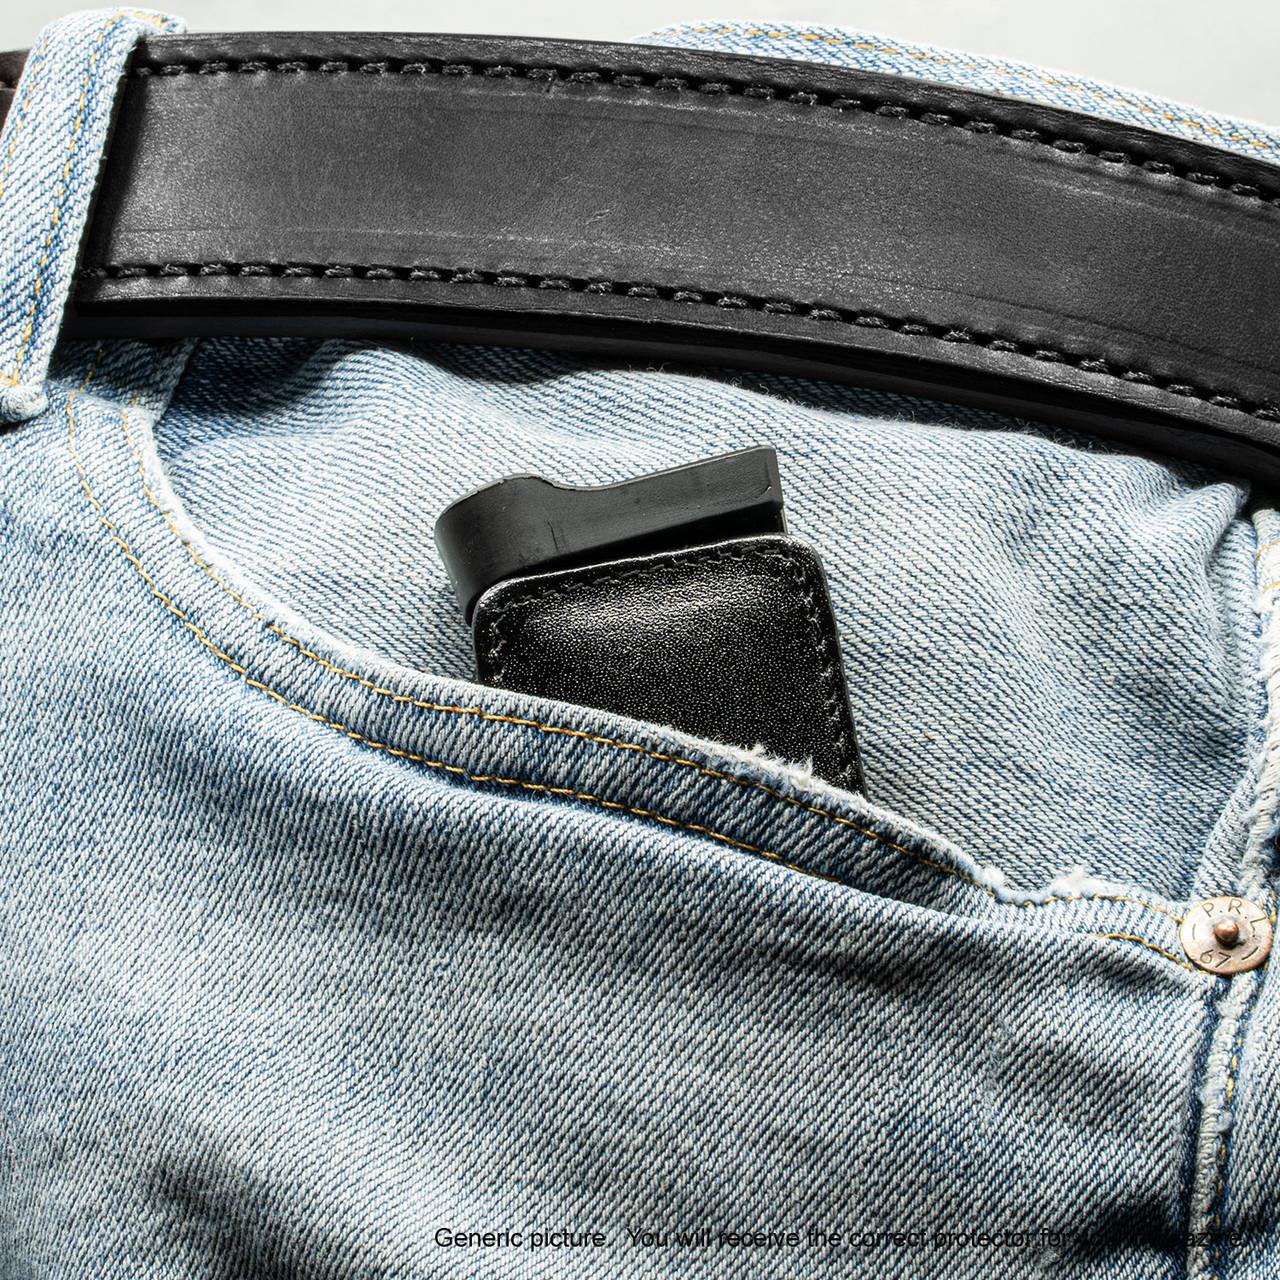 Glock 43X Black Leather Magazine Pocket Protector